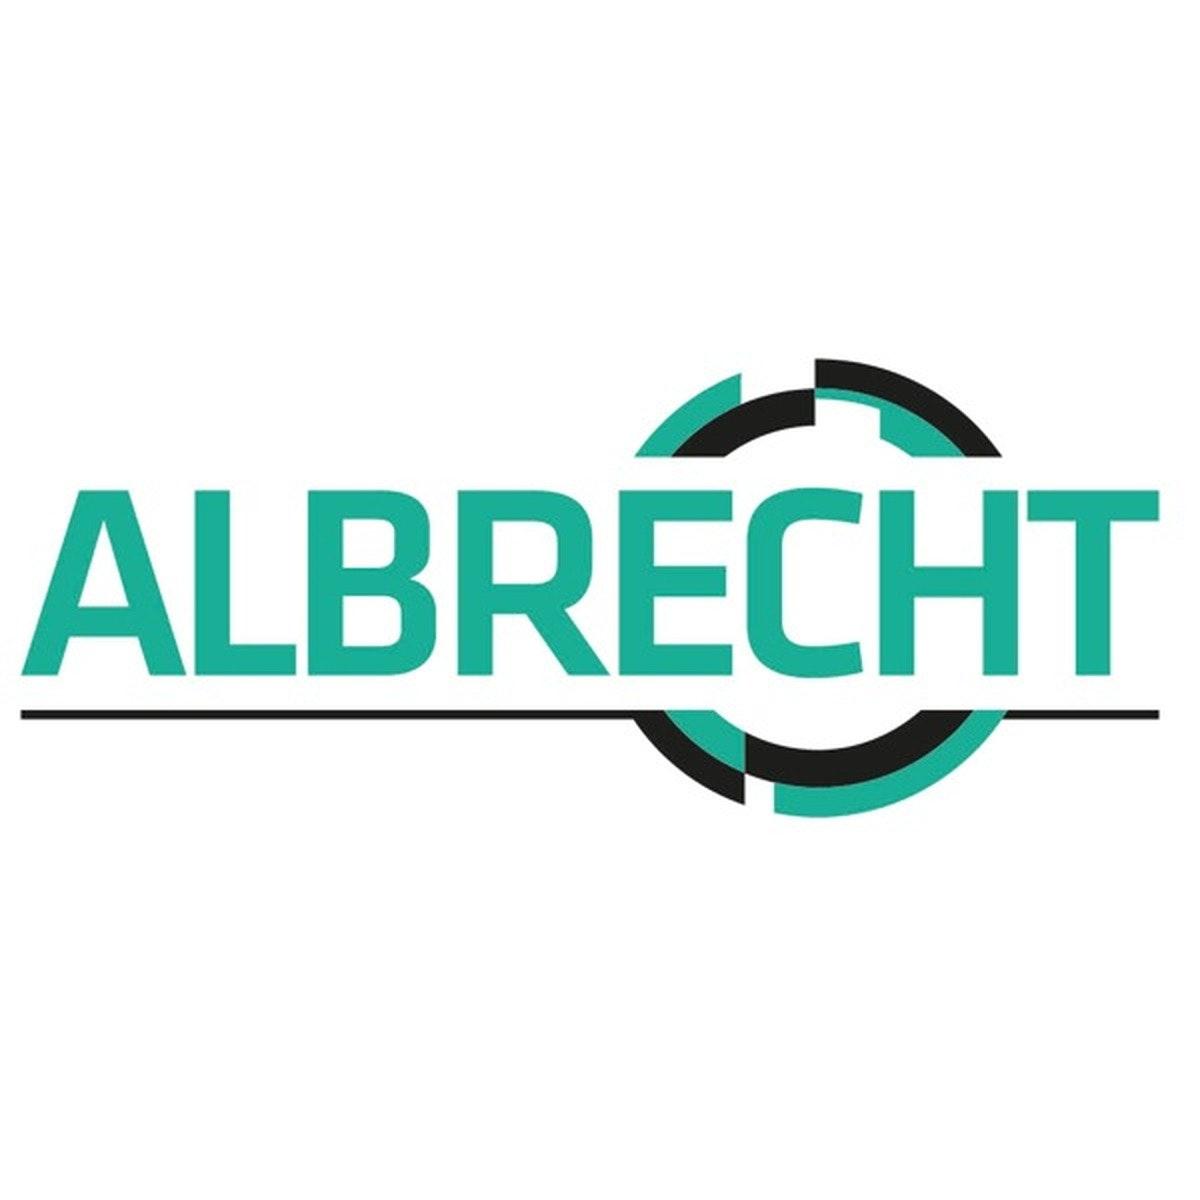 W. Albrecht GmbH & Co. KG